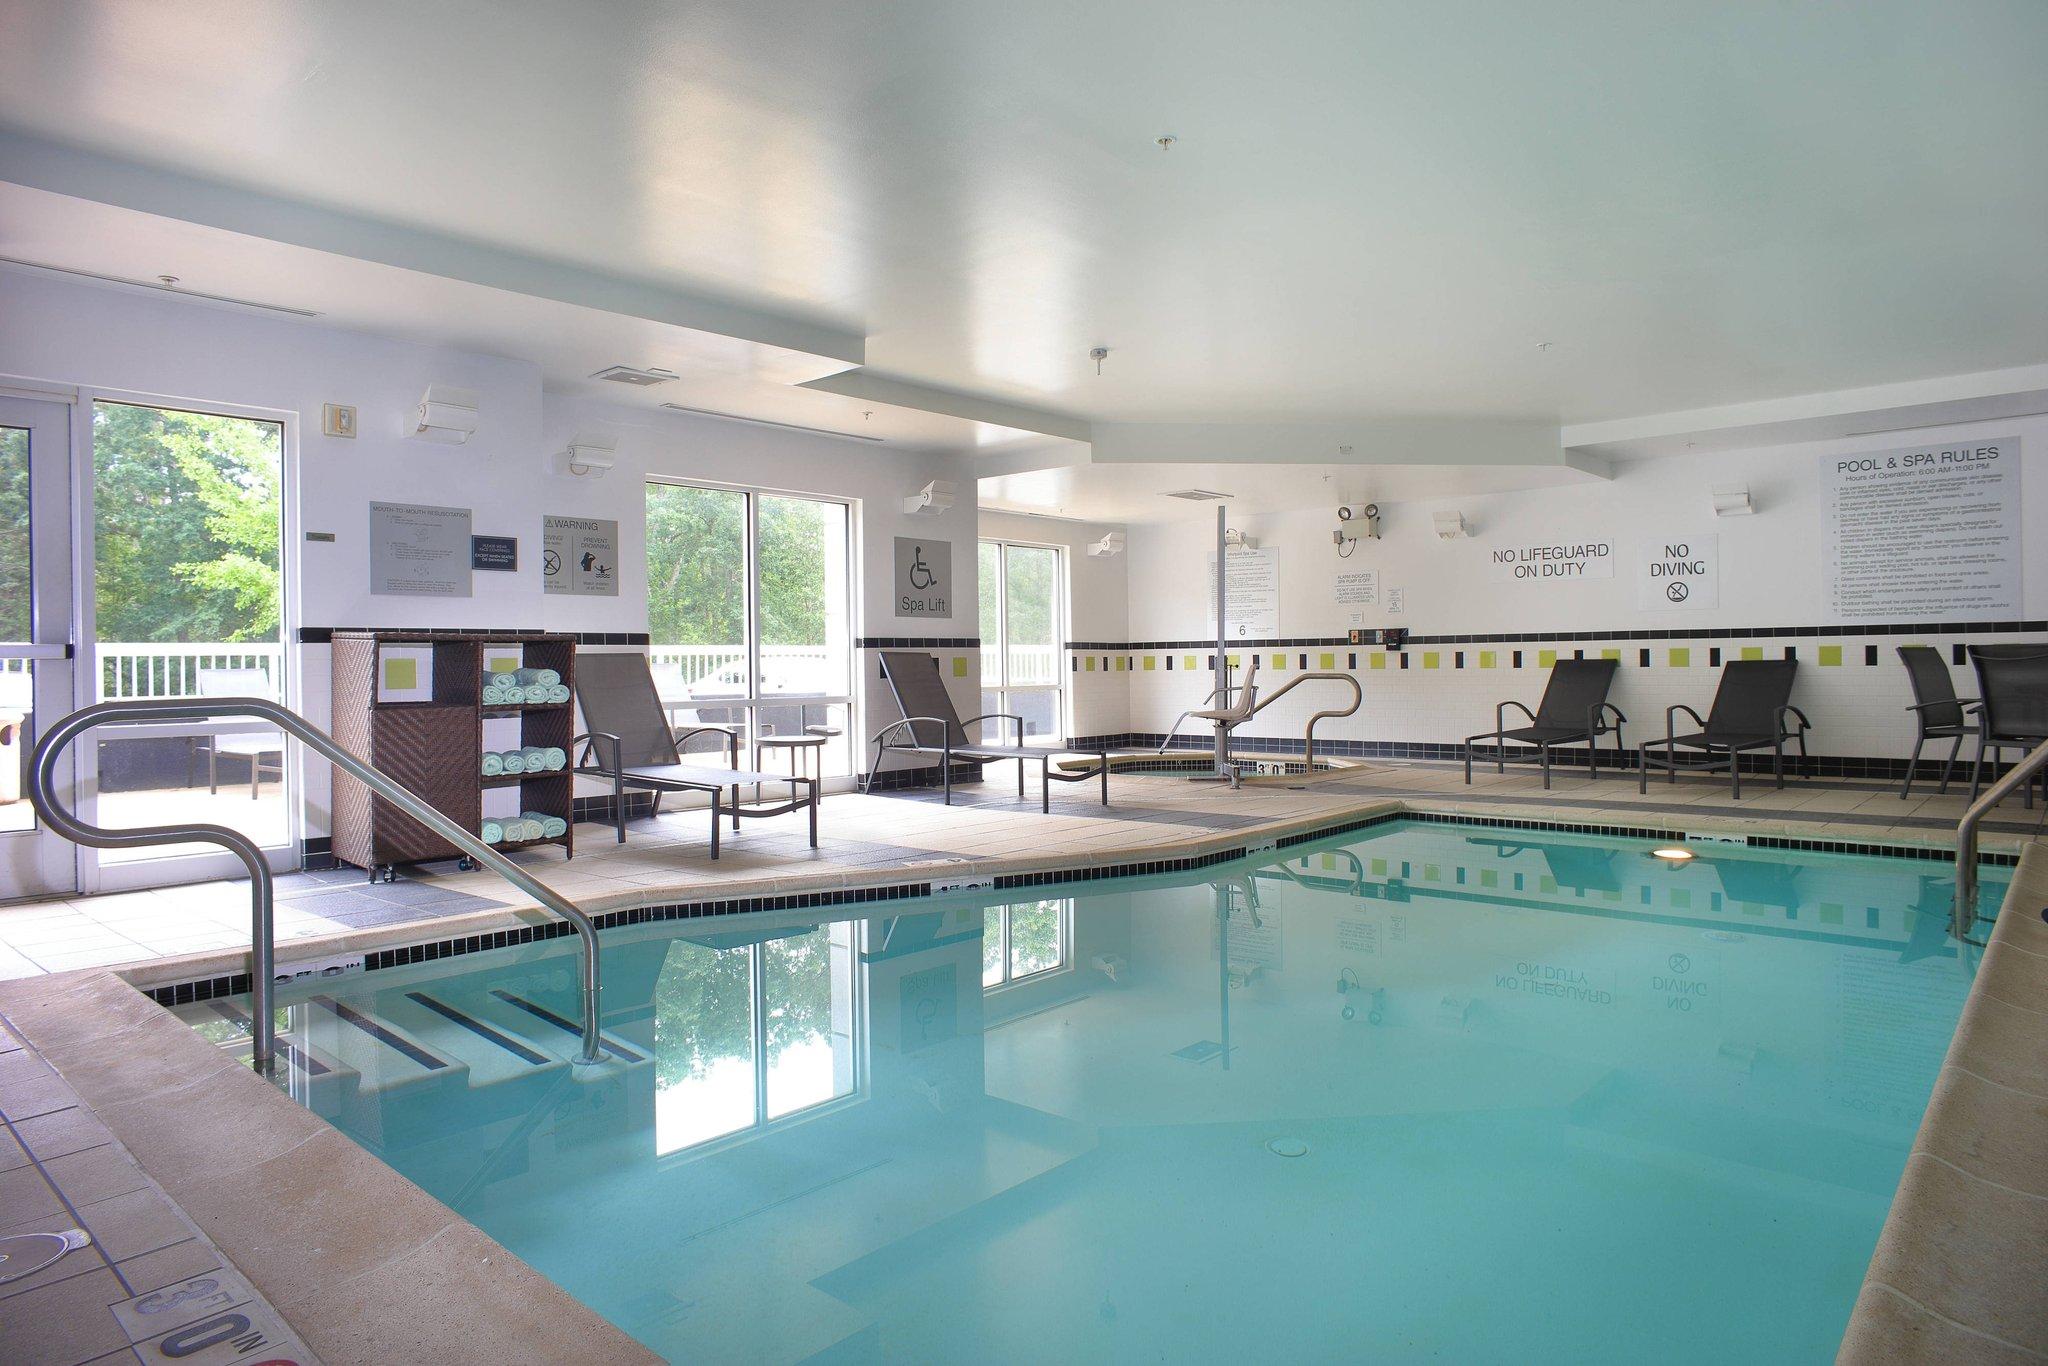 Fairfield Inn and Suites by Marriott Millville Vineland